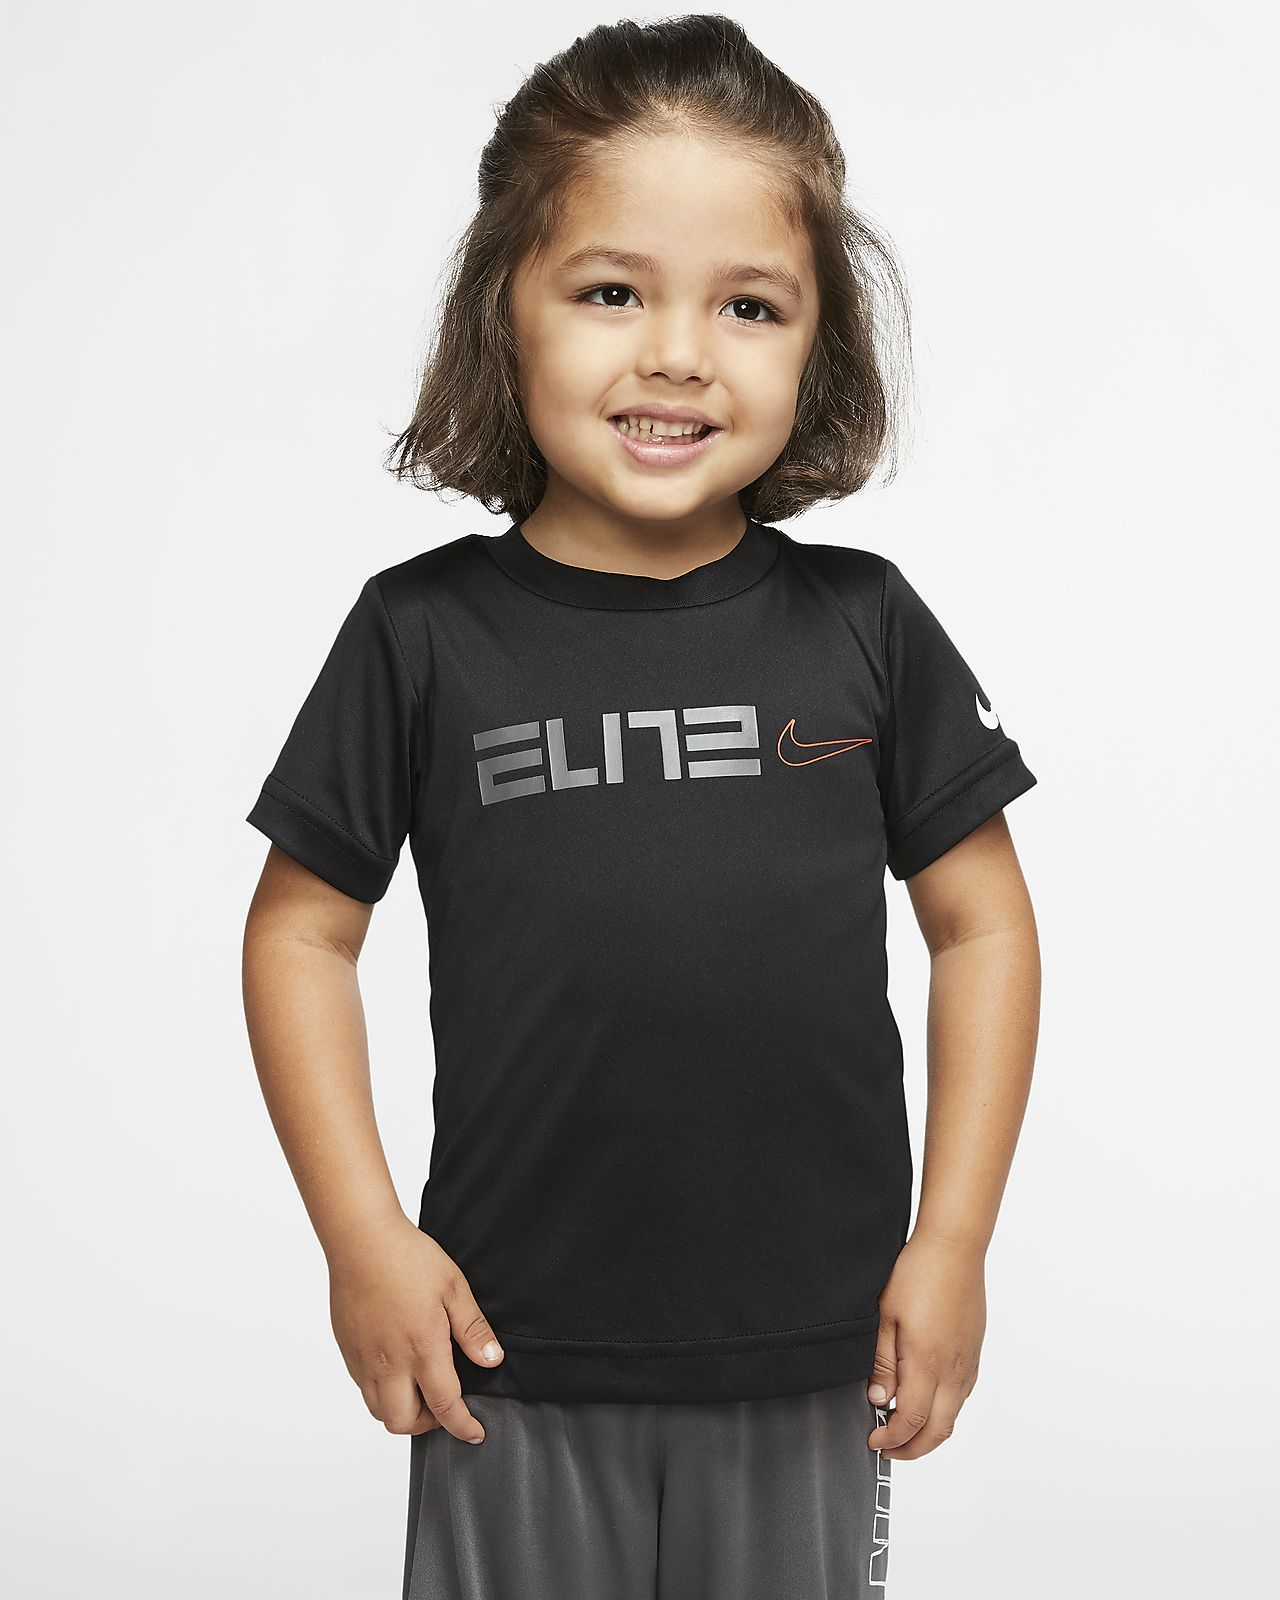 Nike Dri-FIT Elite Toddler Short-Sleeve T-Shirt